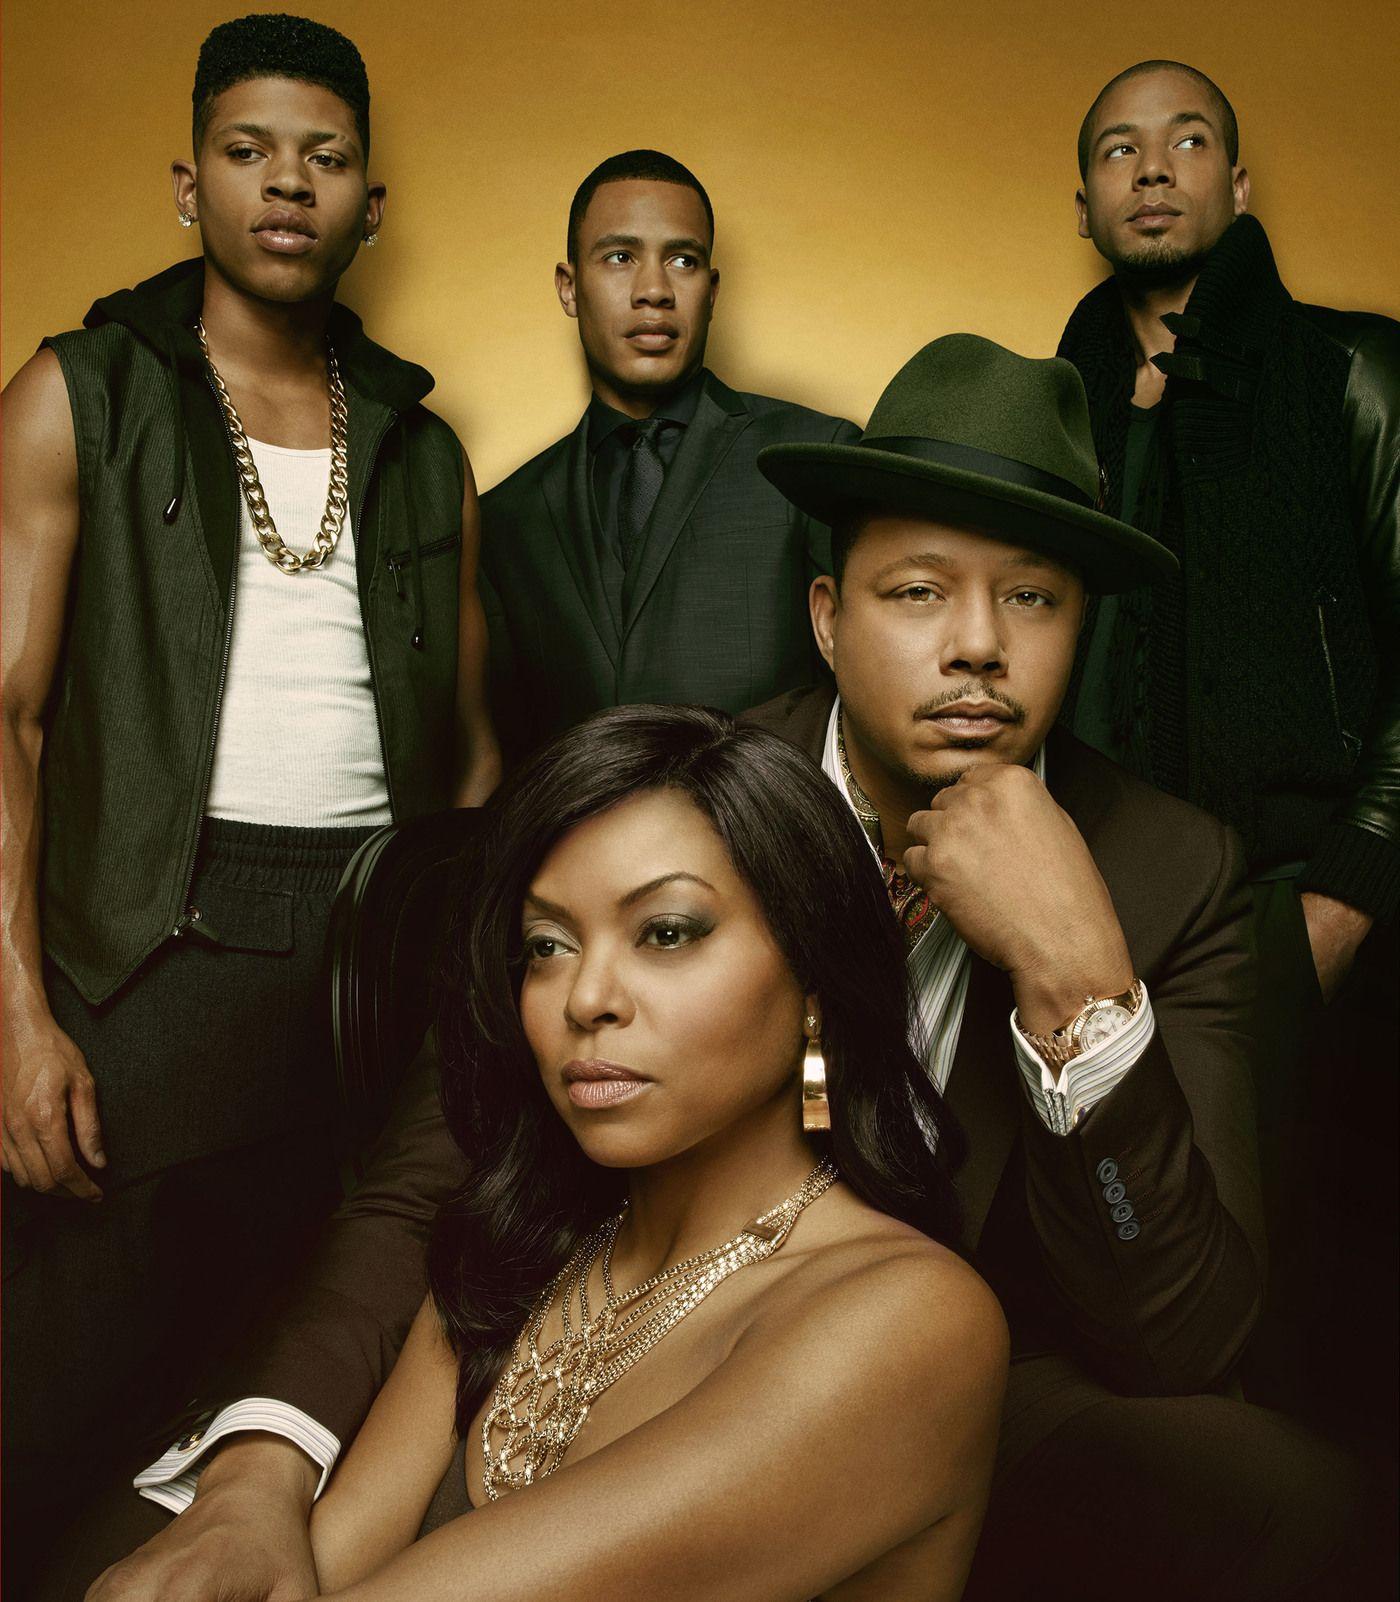 Fox S Empire Sets Dynasty Style Soap Opera To A Hip Hop Beat